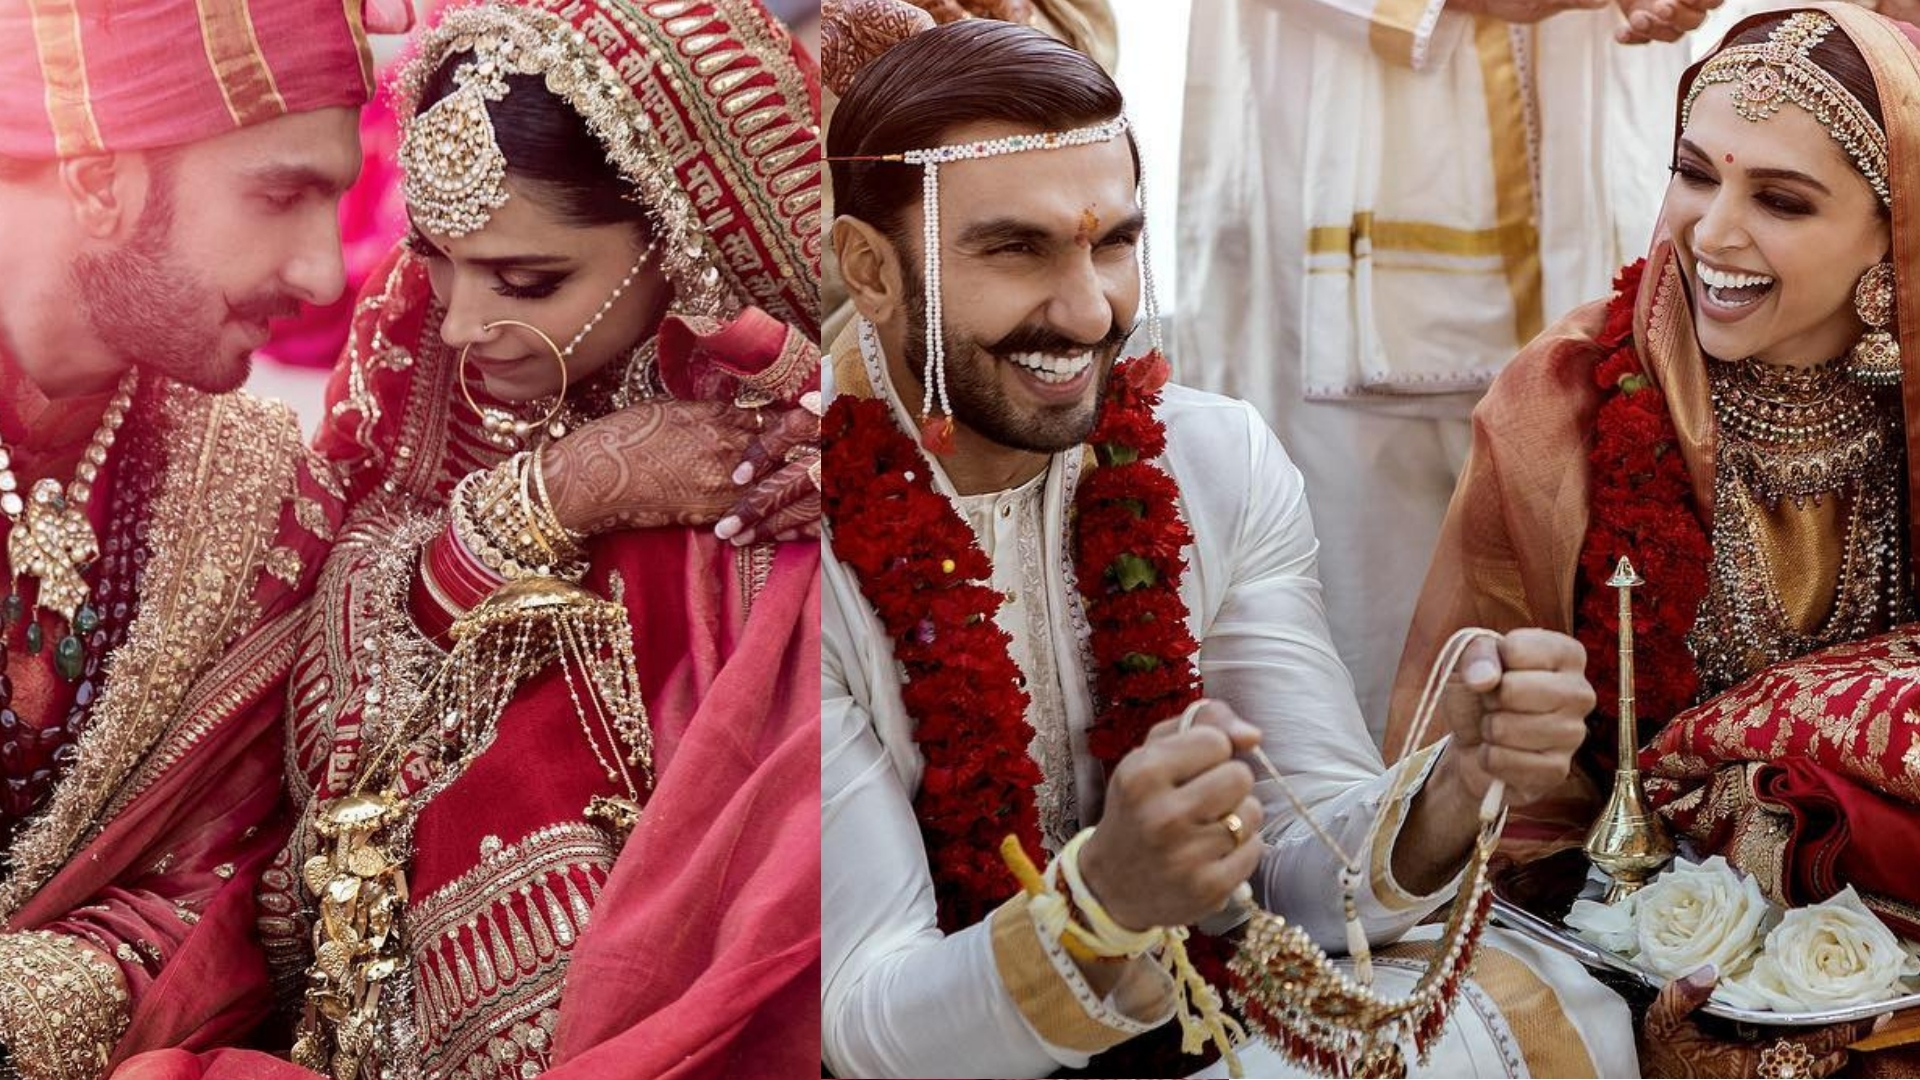 Deepika-Ranveer Wedding Photos Released: Check Latest Pics ...